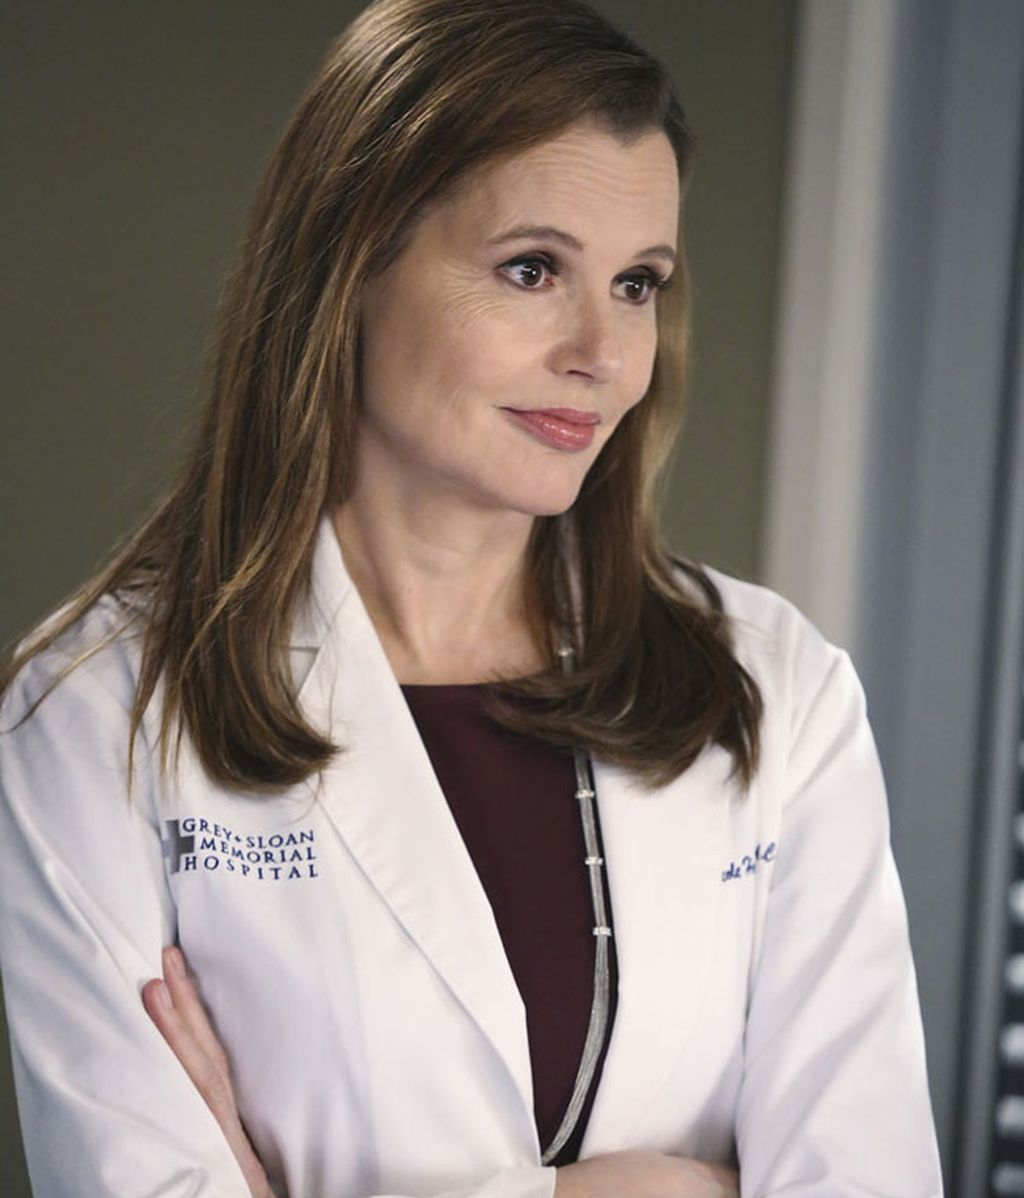 Geena Davis será la doctora Nicole Herman, una experta cirujana neonatal